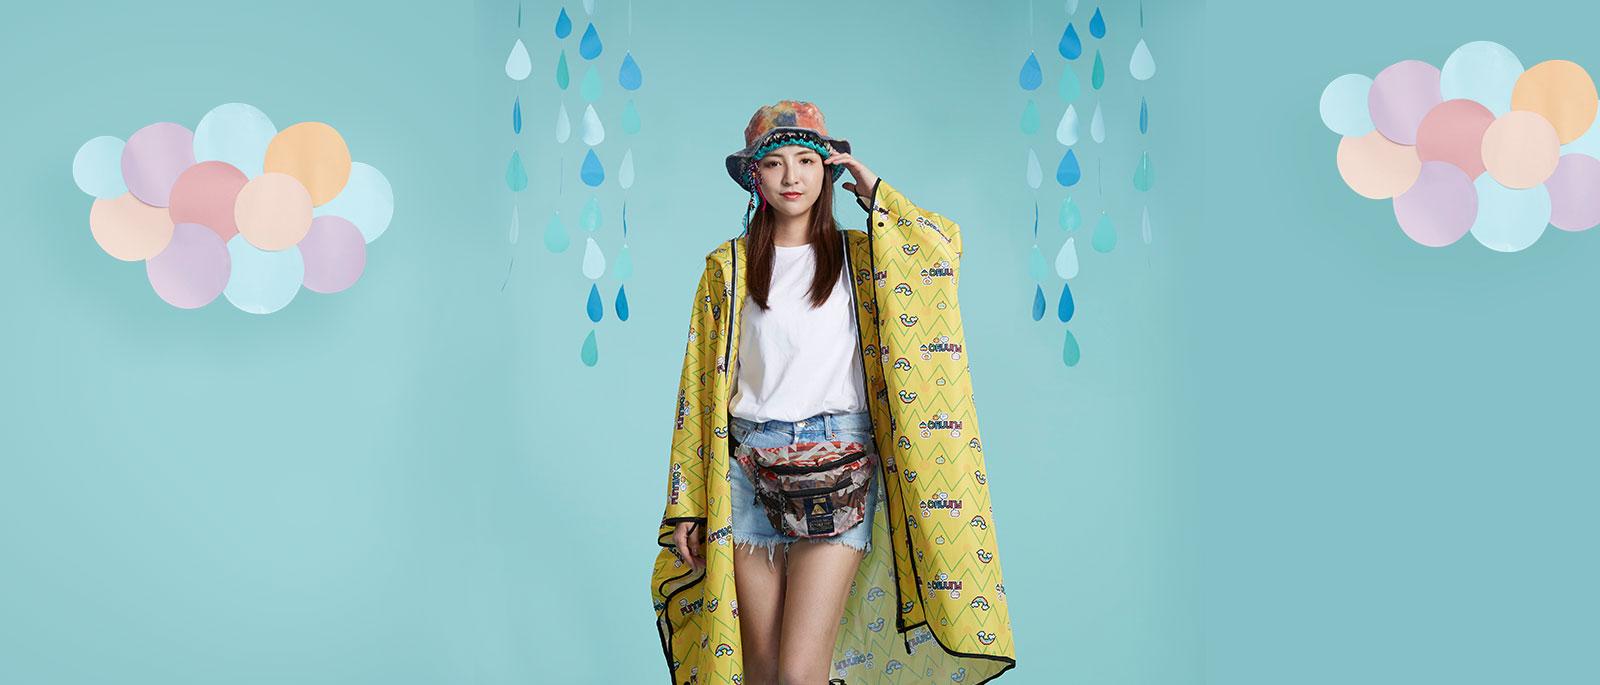 Funny Q |趣味生活 | 是雨衣也是風衣